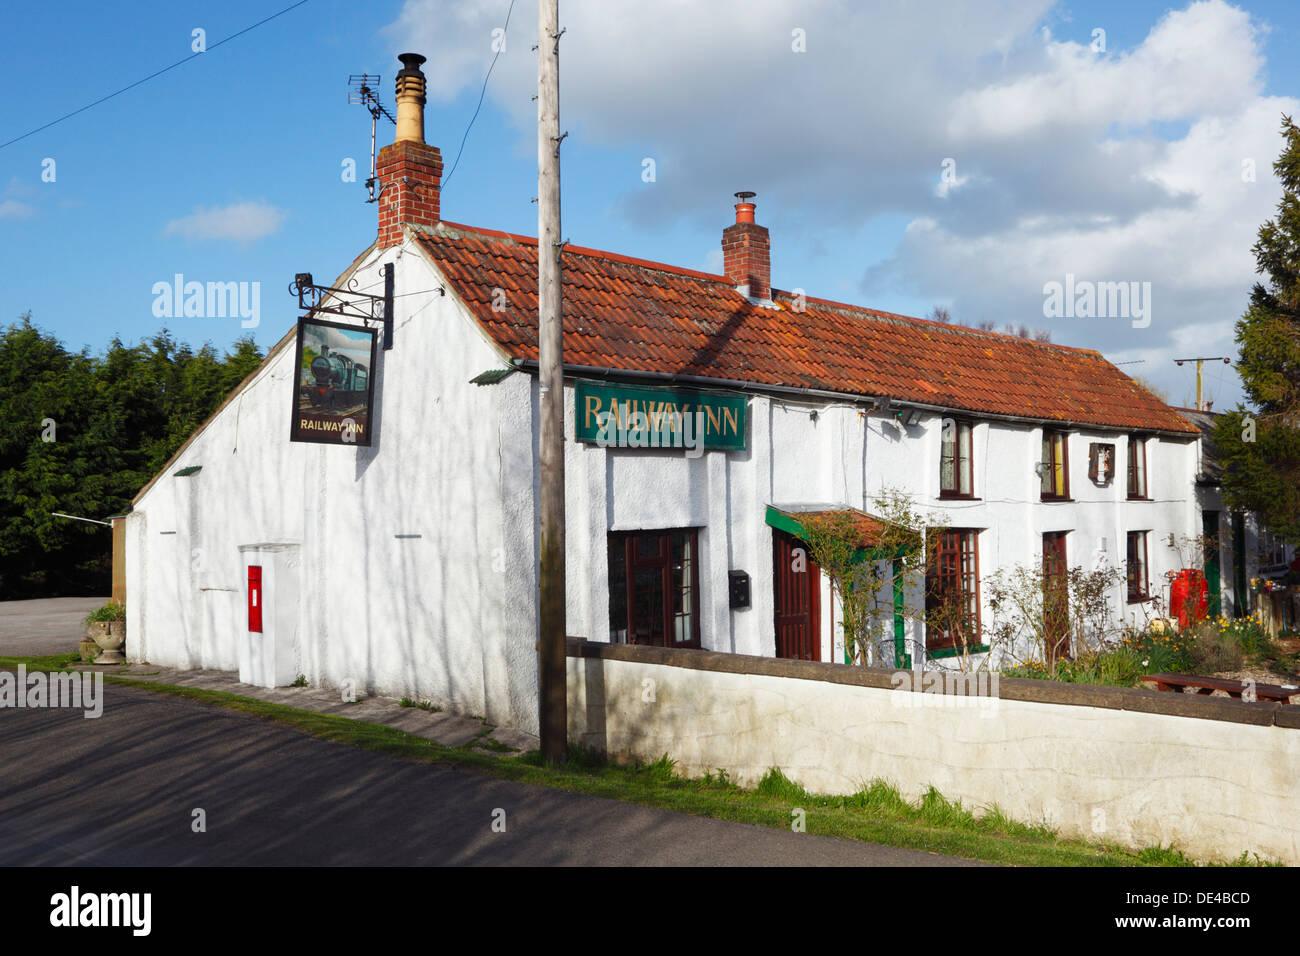 The Railway Inn at Ashcott Corner. Somerset. England. UK. - Stock Image